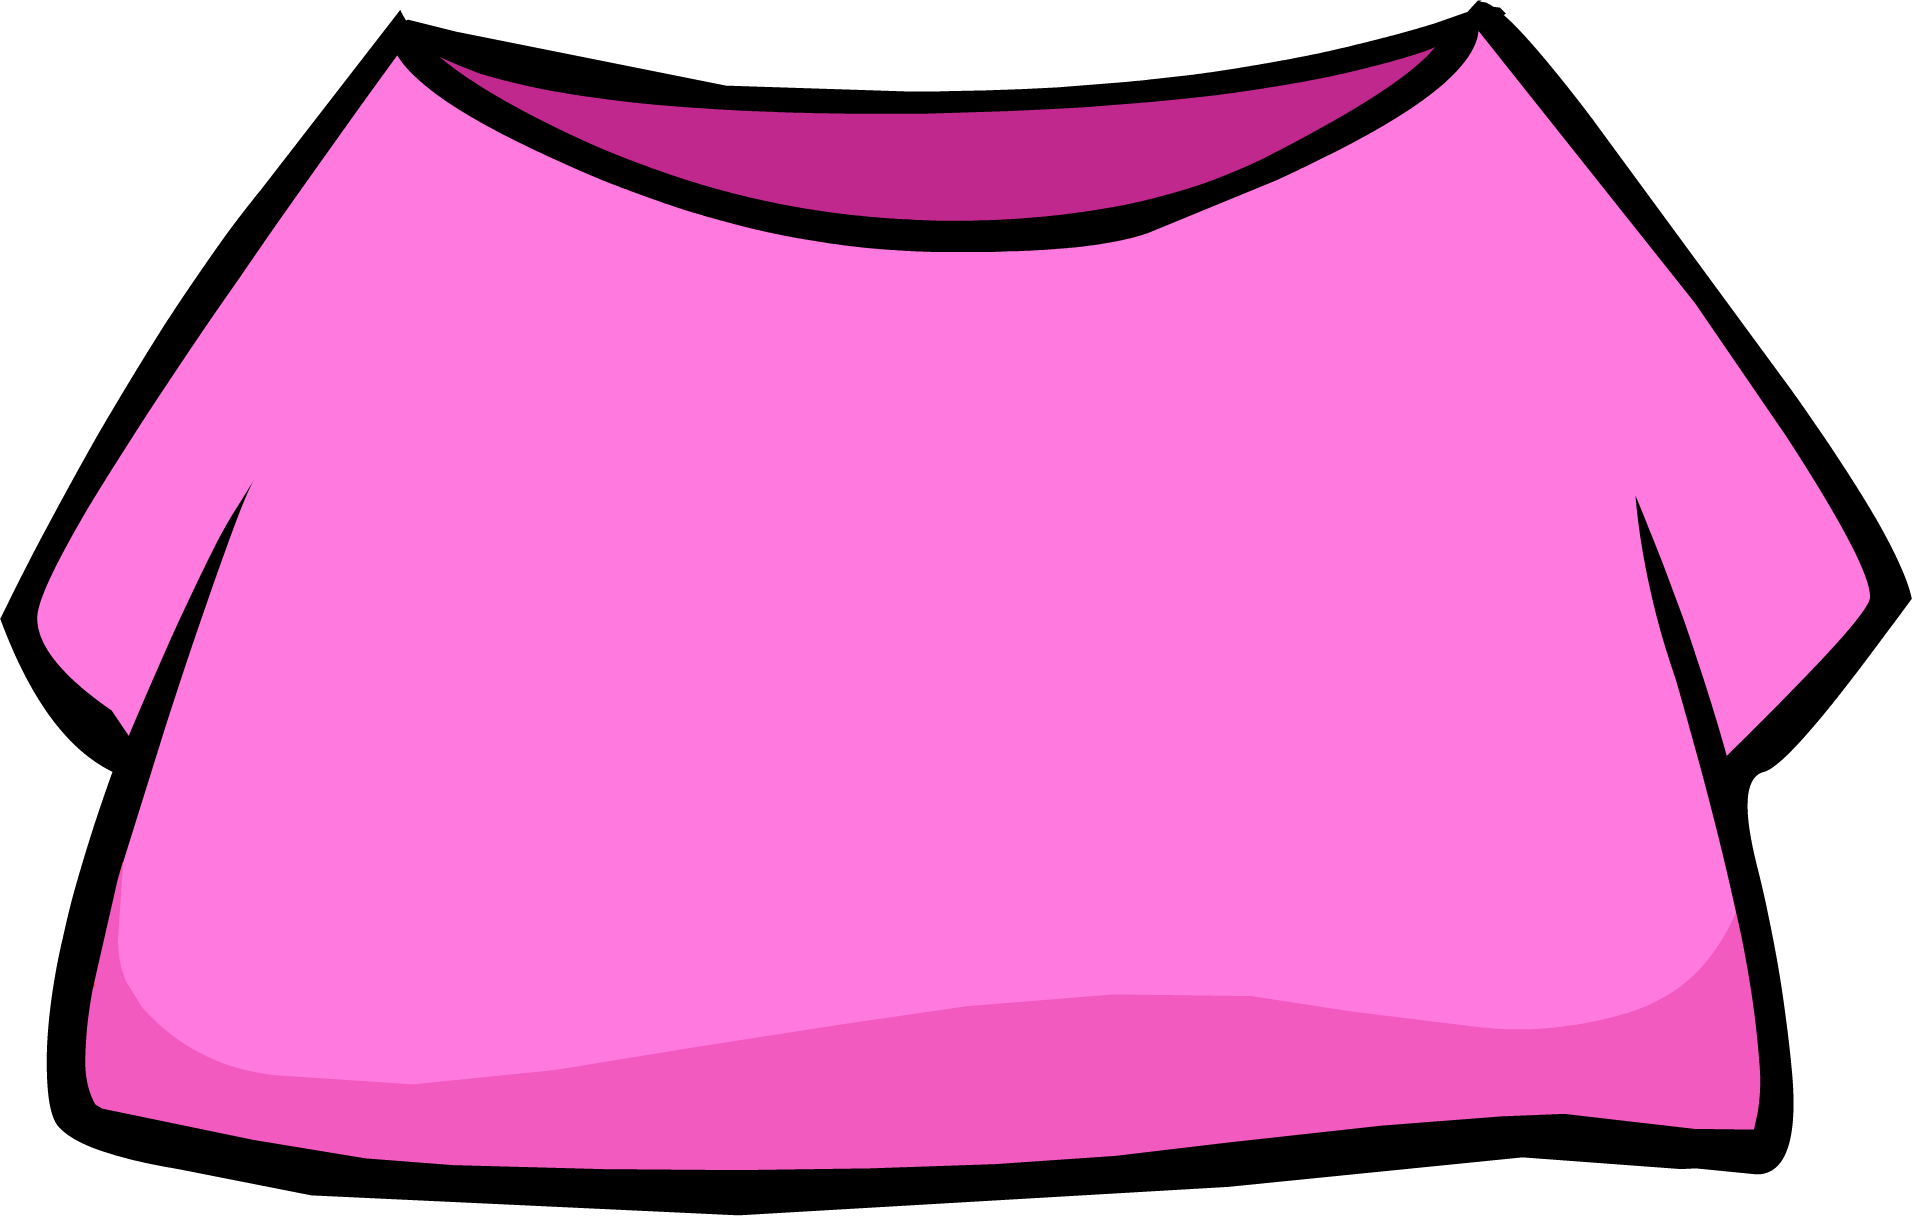 Pink Shirt | Club Penguin Wiki | FANDOM powered by Wikia